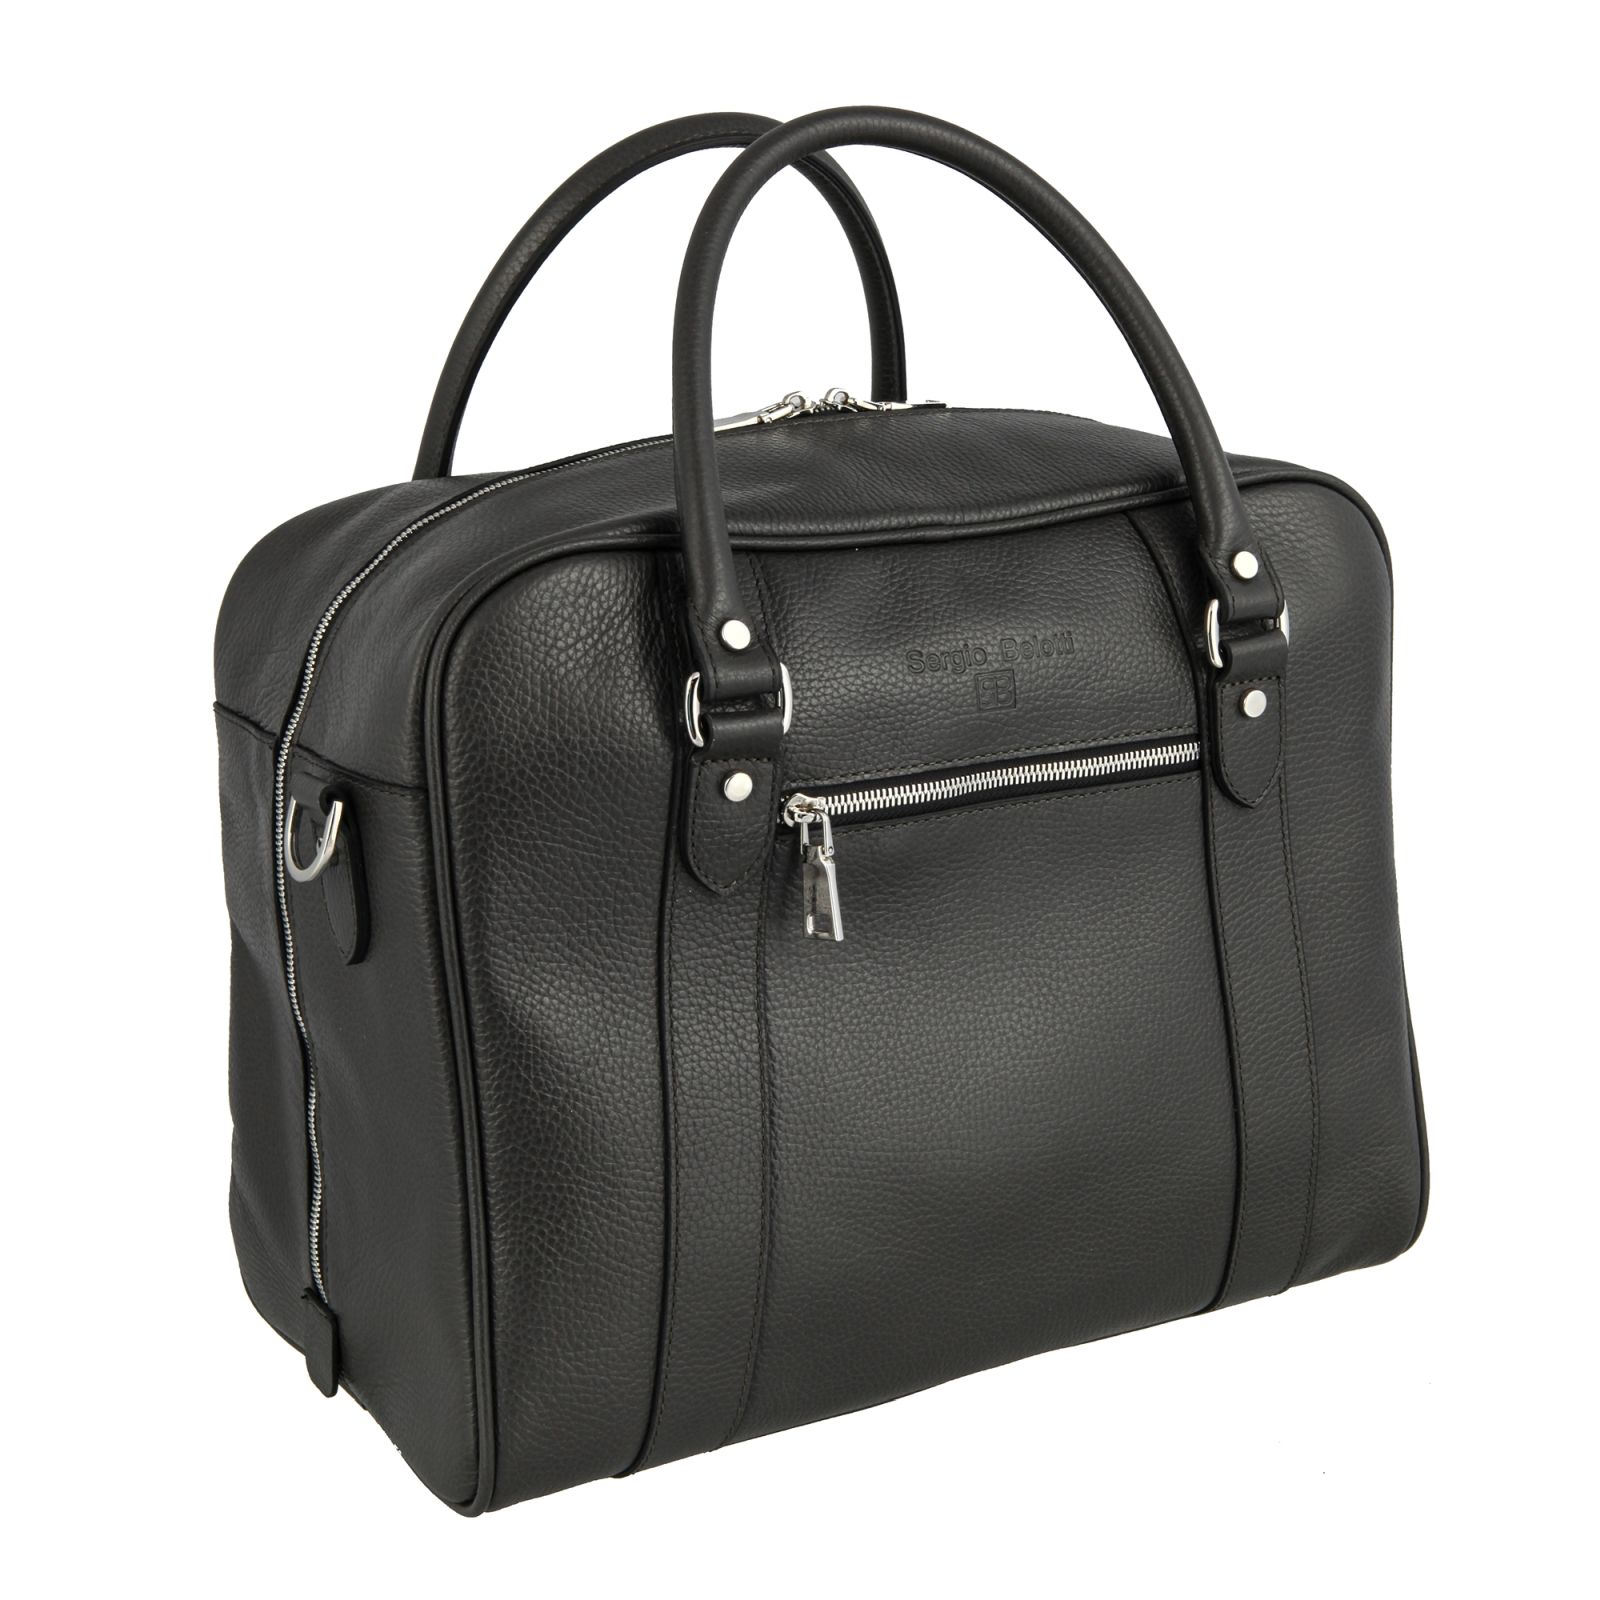 Дорожная сумка Sergio Belotti 8014 Napoli brown 30 x 36 x 21 см.